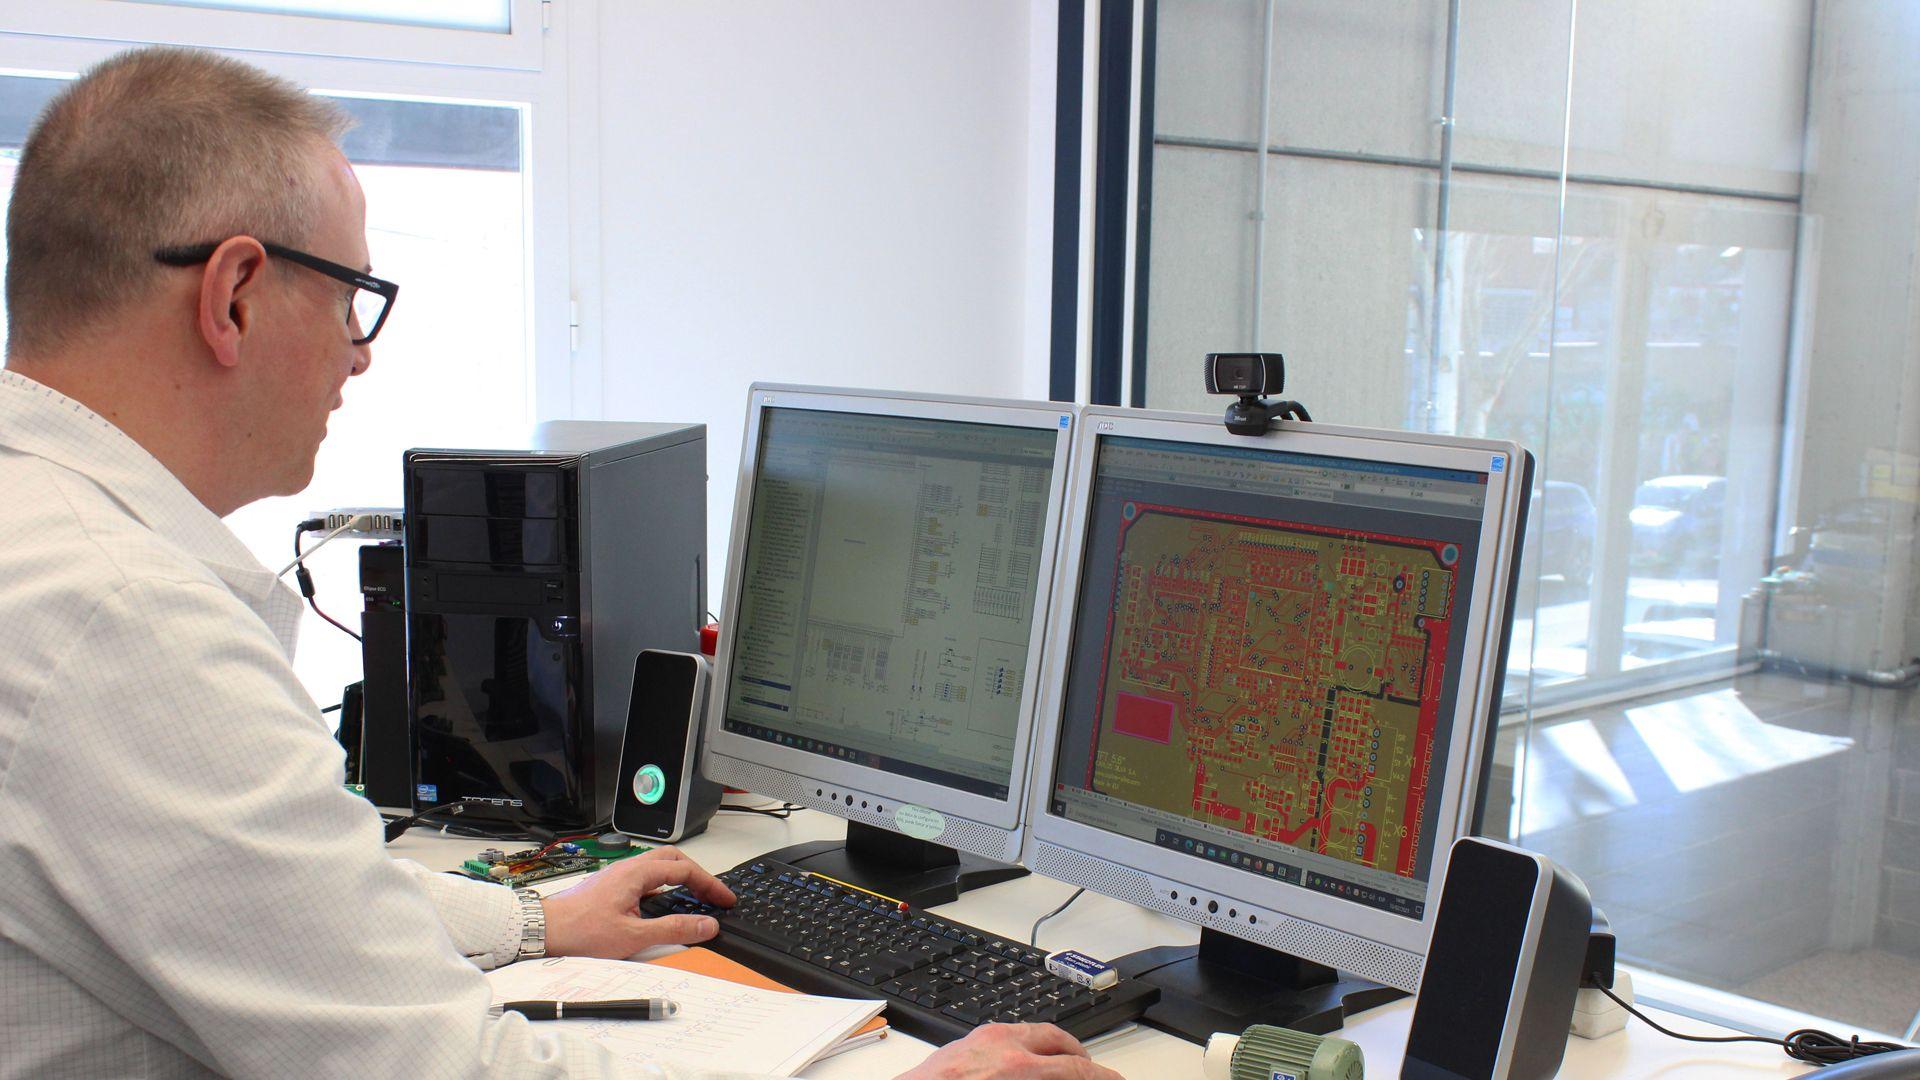 Circuitos electrónicos Madrid Centro